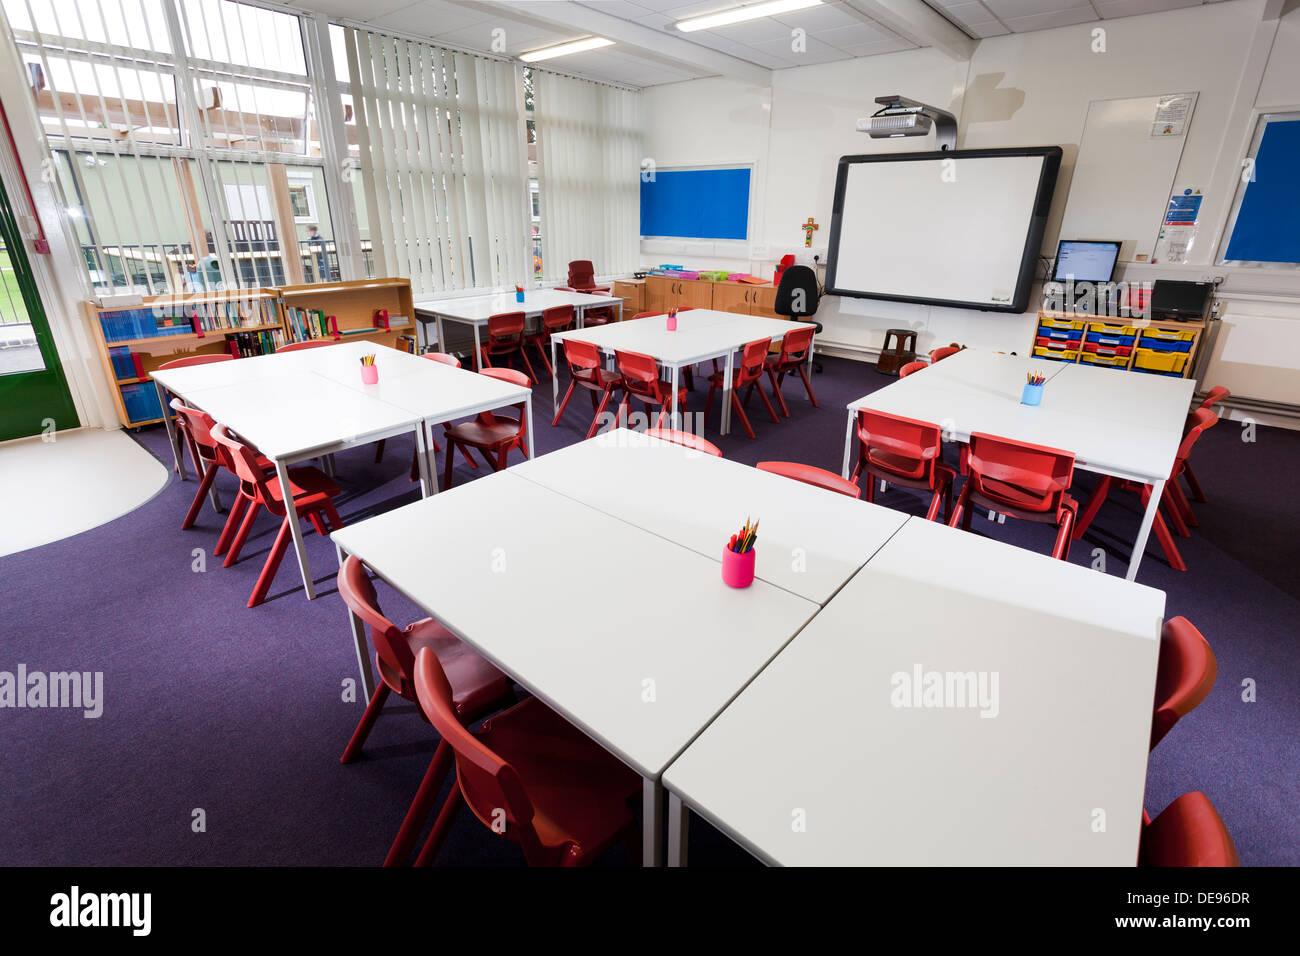 unoccupied infant school classroom - Stock Image